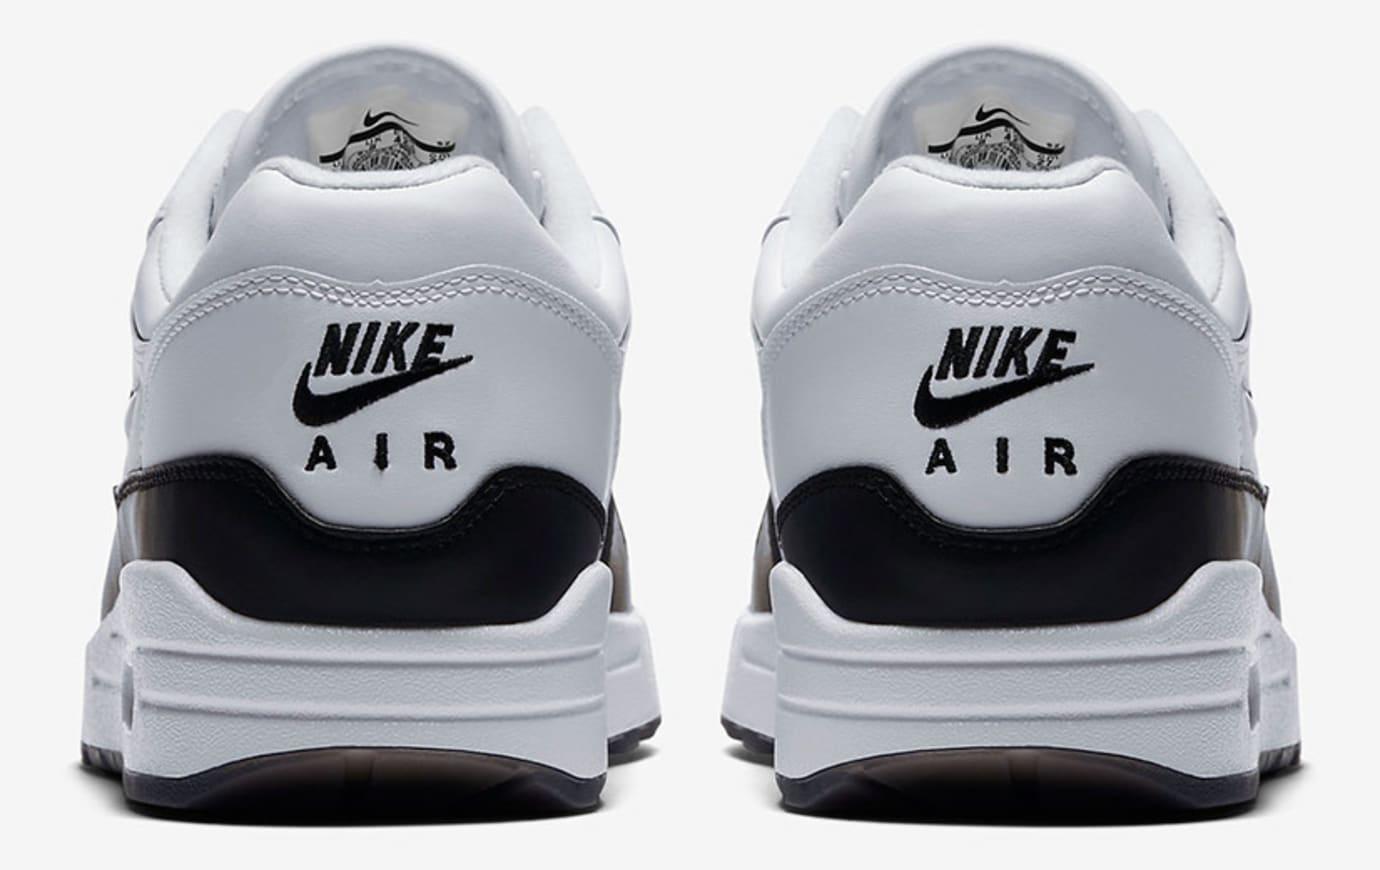 Nike Air Max 1 Jewel 'Black/White' 918354-100 (Heel)